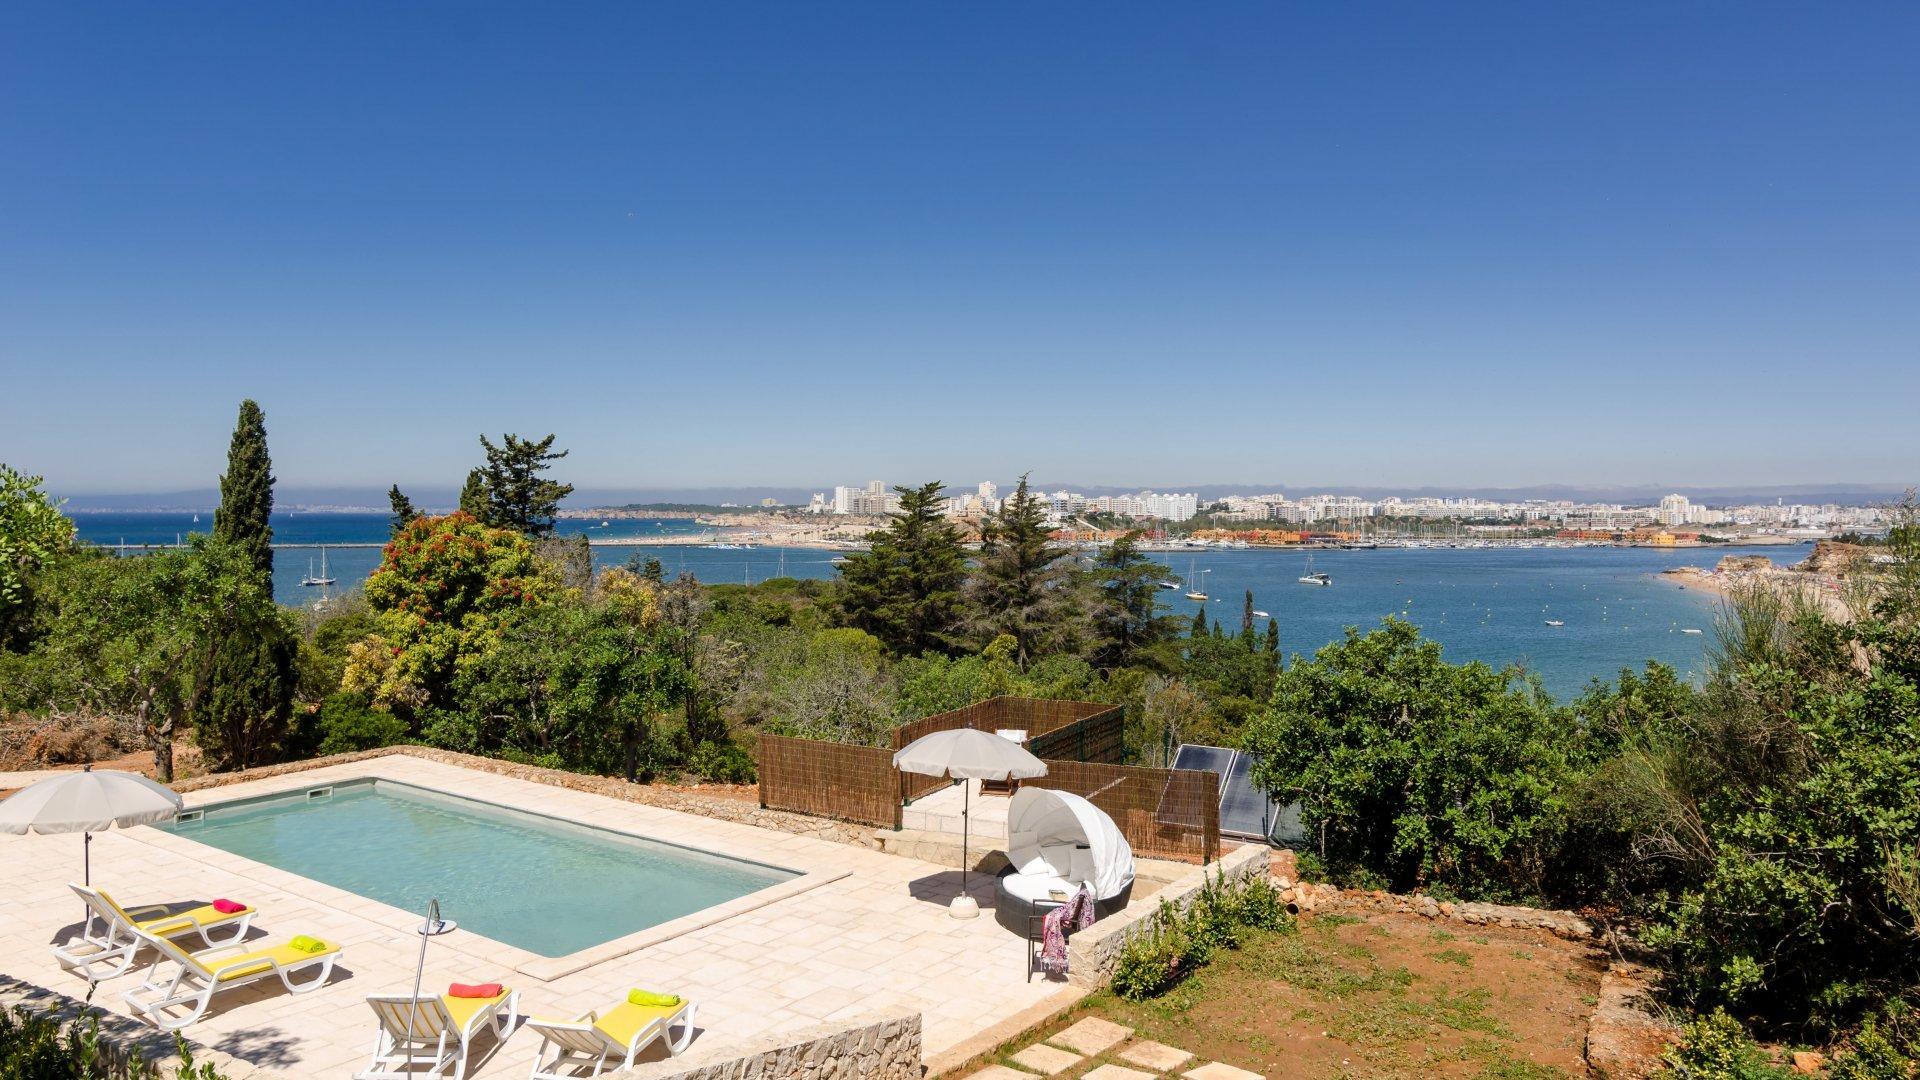 Villa Honeycomb - Ferragudo, Portimão, Algarve - Casa_Colmo_aa_5-min.jpg